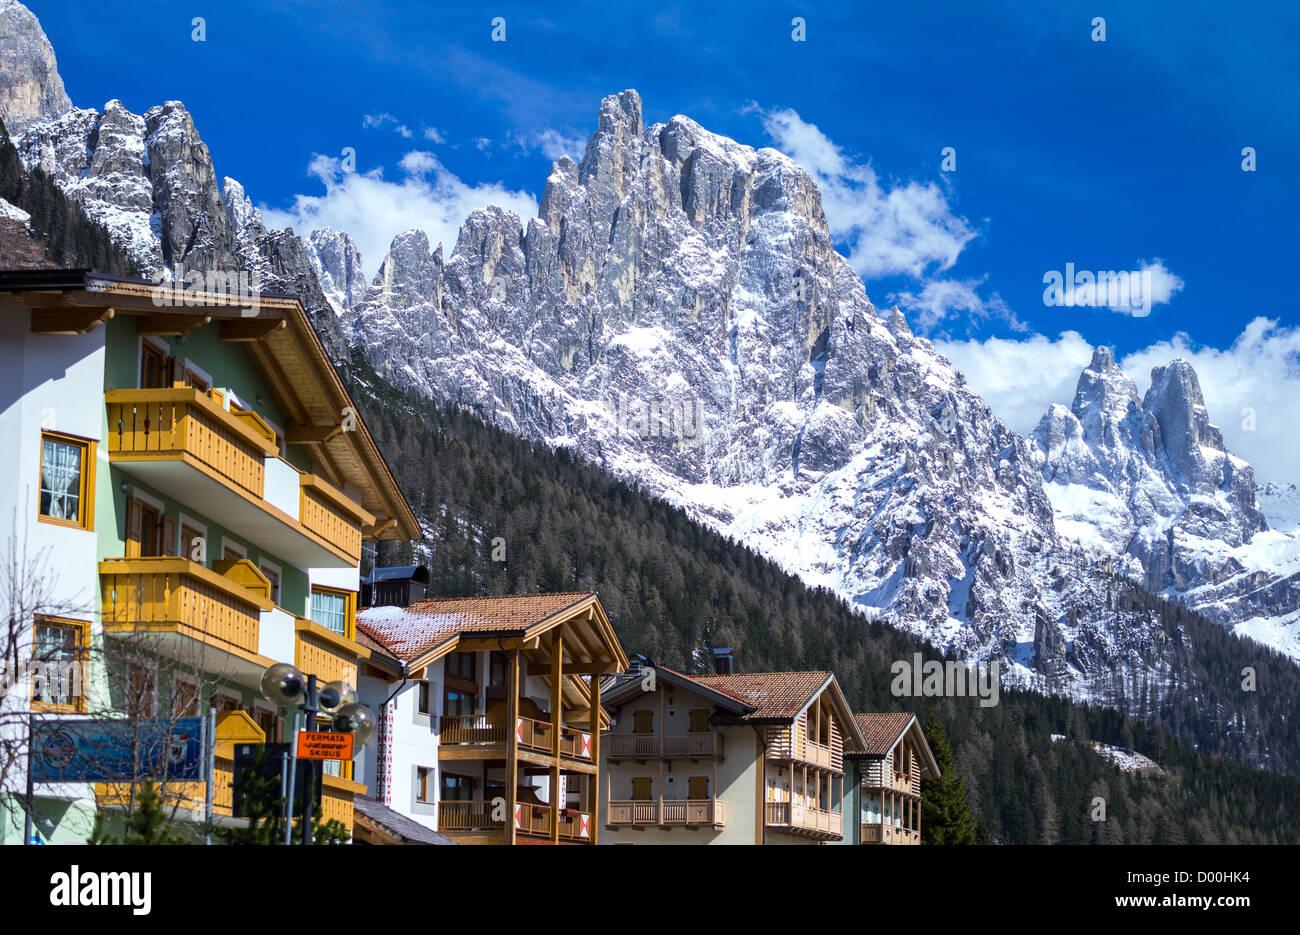 Italy, Dolomites, Trentino Alto Adige, the houses of San Martino di Castrozza Stock Photo